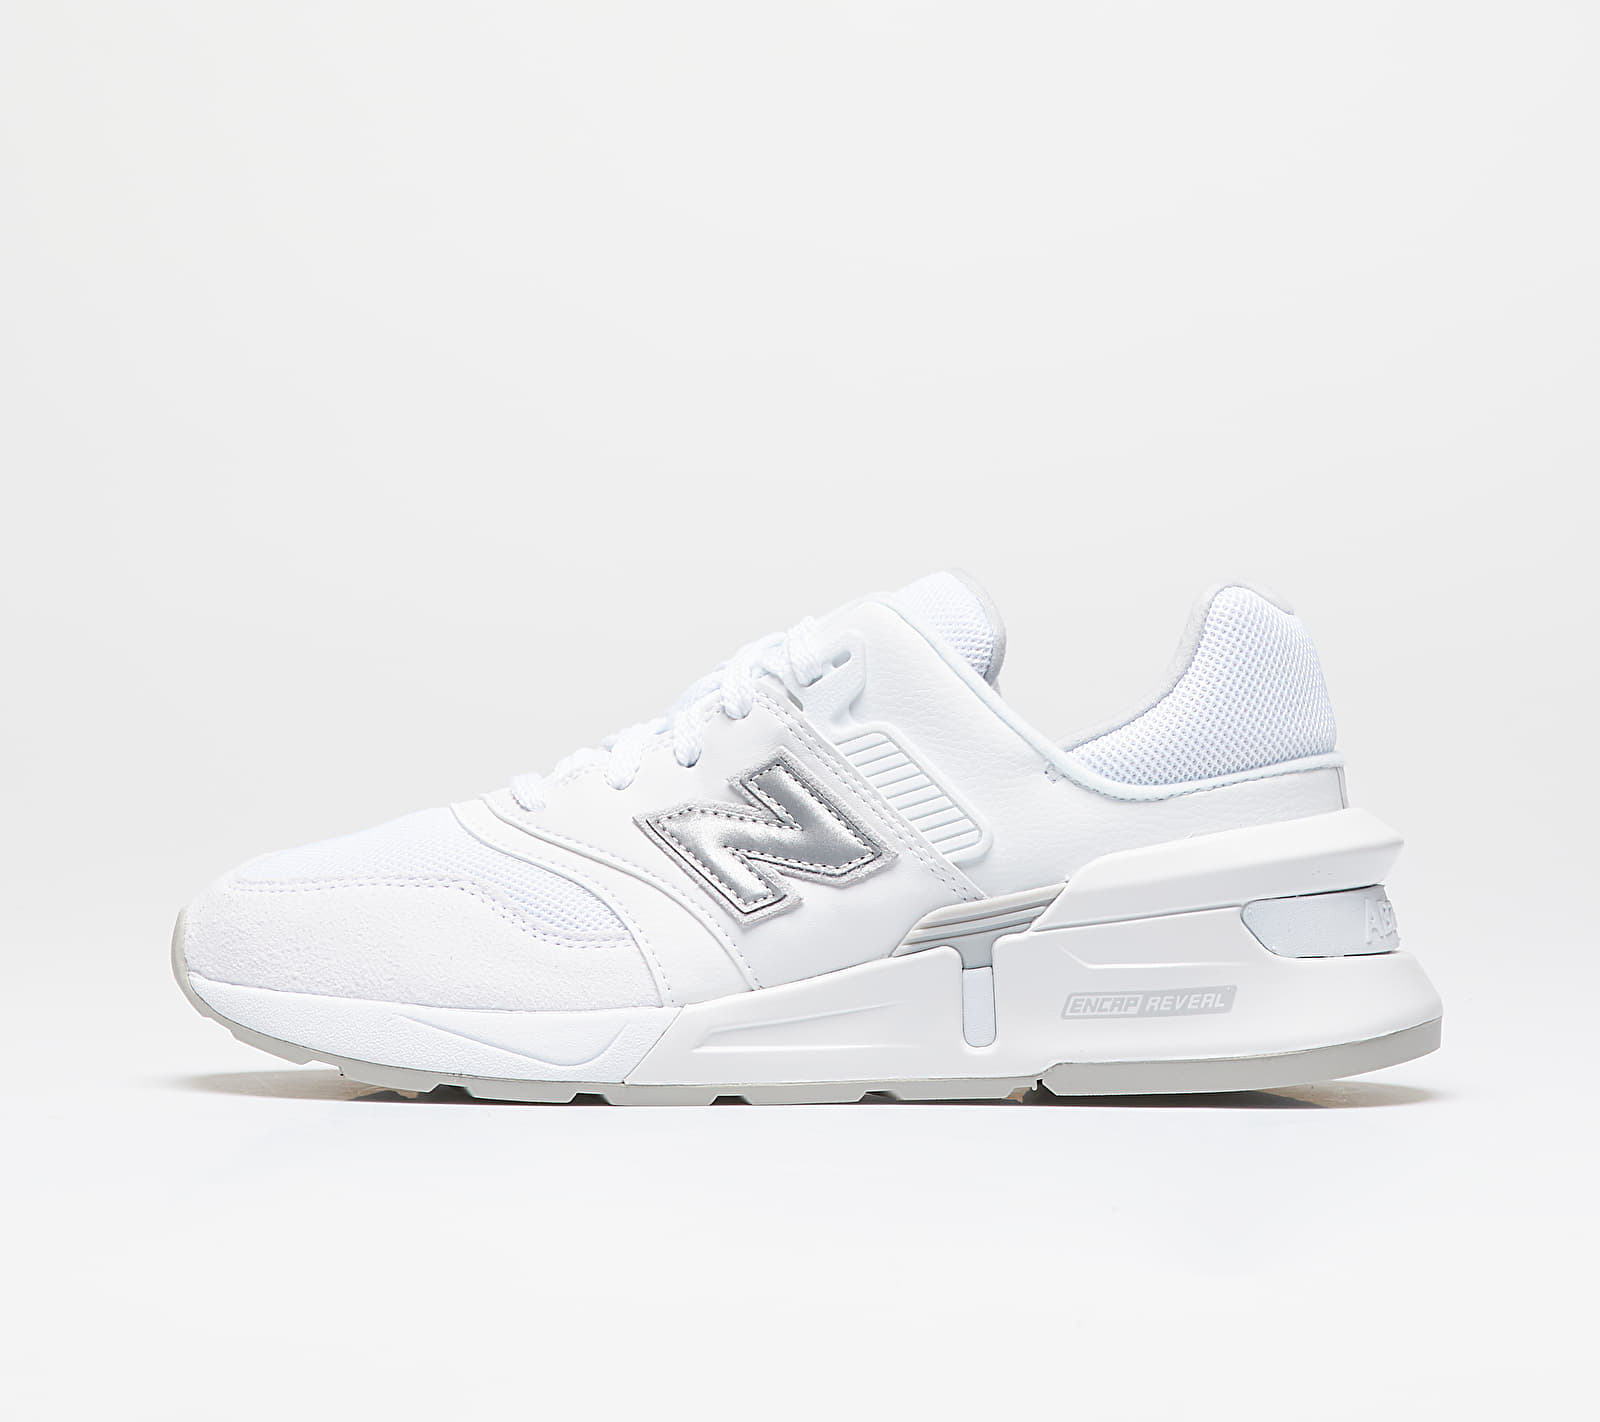 New Balance 997 White EUR 44.5